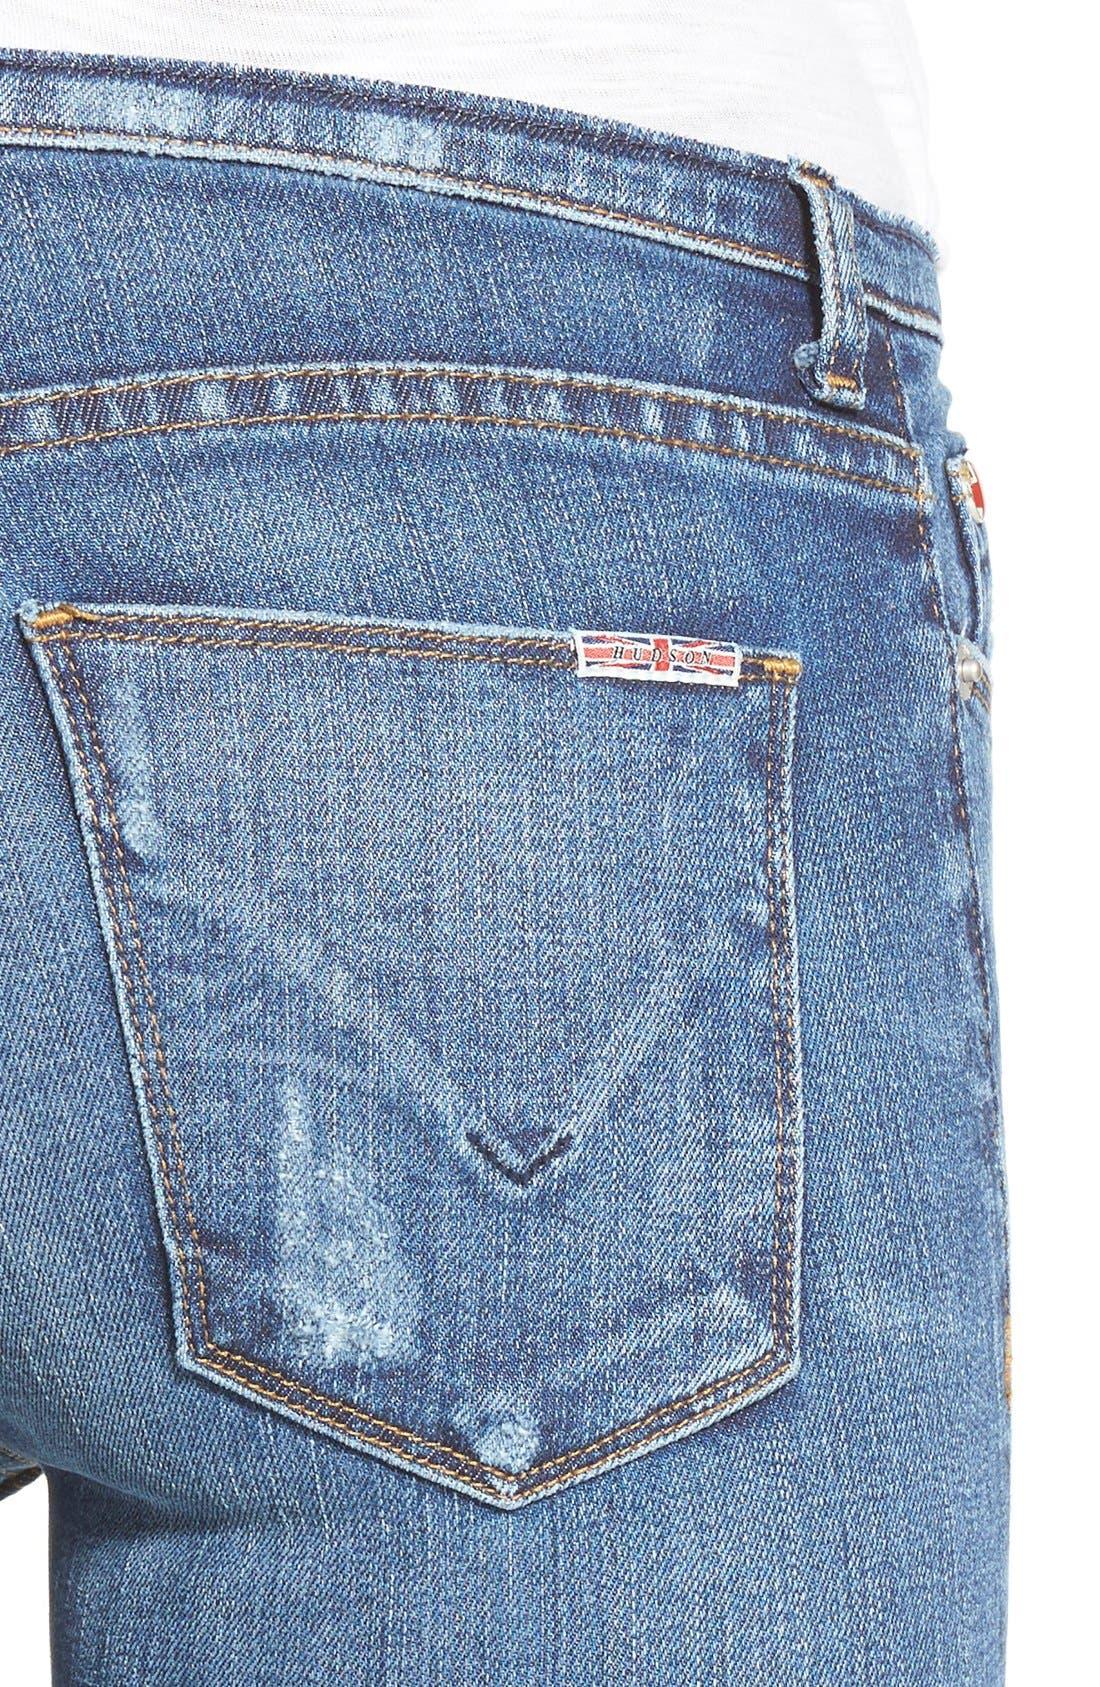 Alternate Image 4  - Hudson Jeans 'Krista' Raw Hem Ankle Super Skinny Jeans (Point Break)